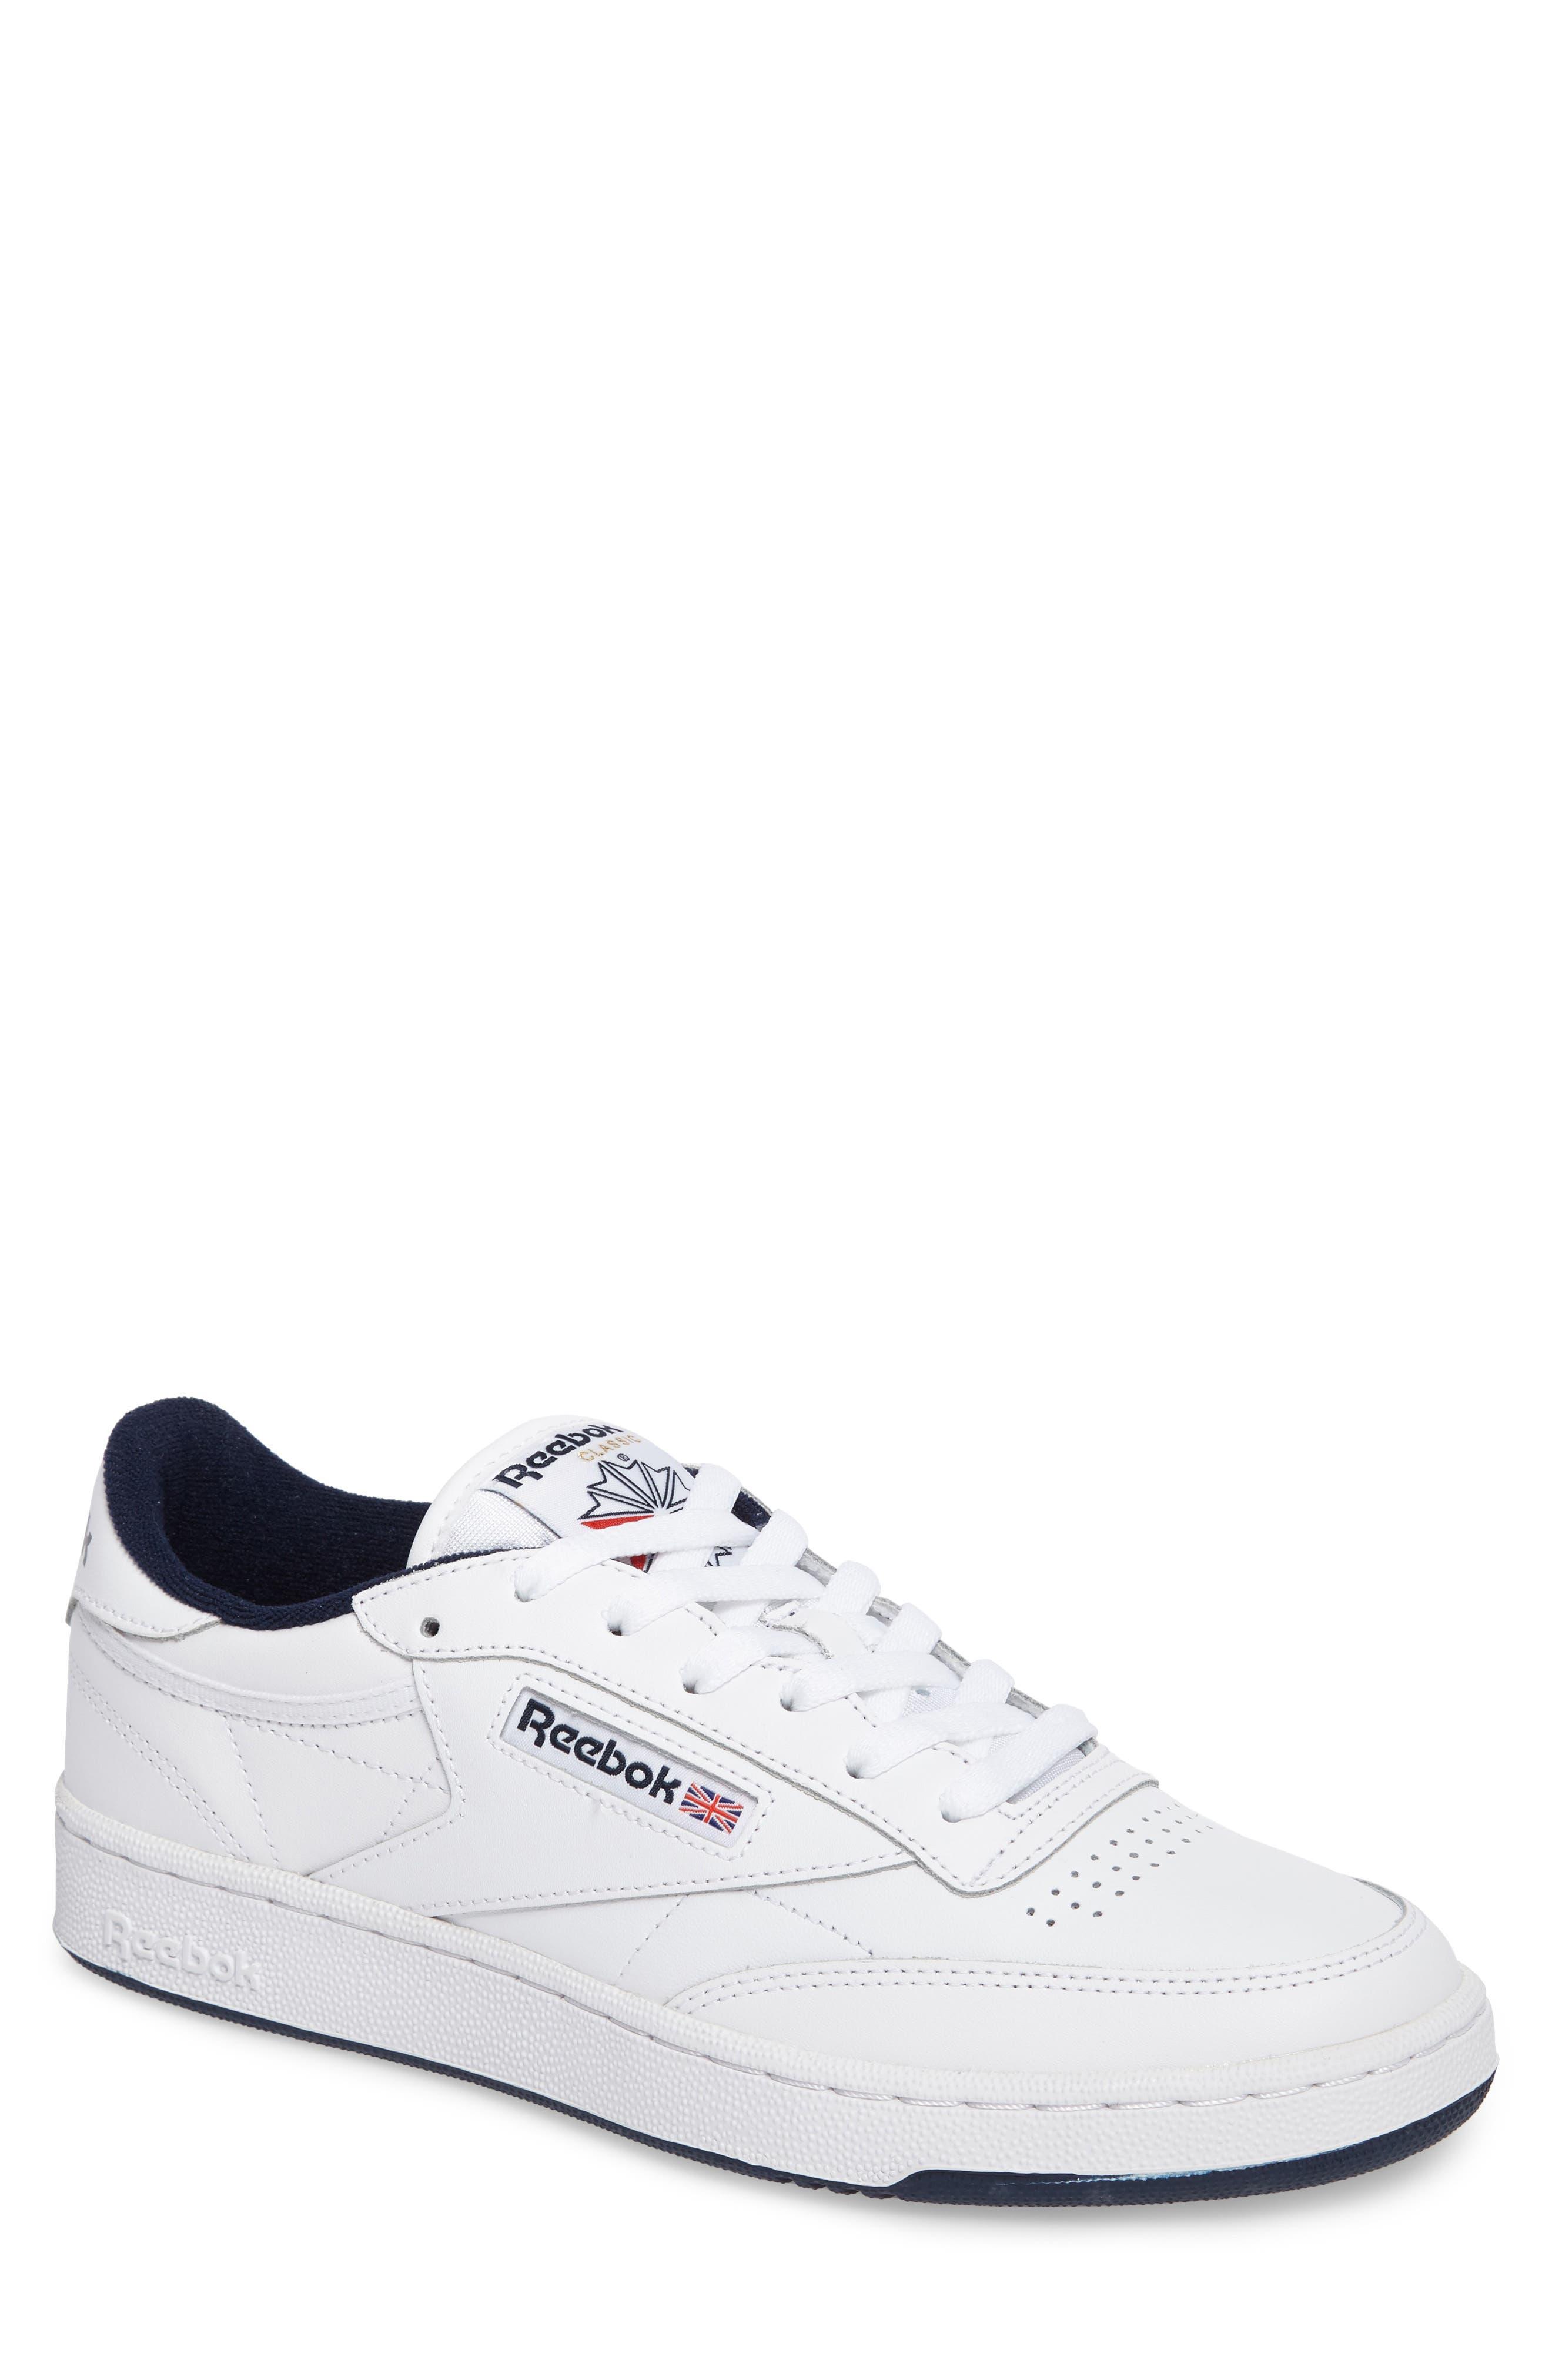 Reebok Club C 85 Sneaker (Men)